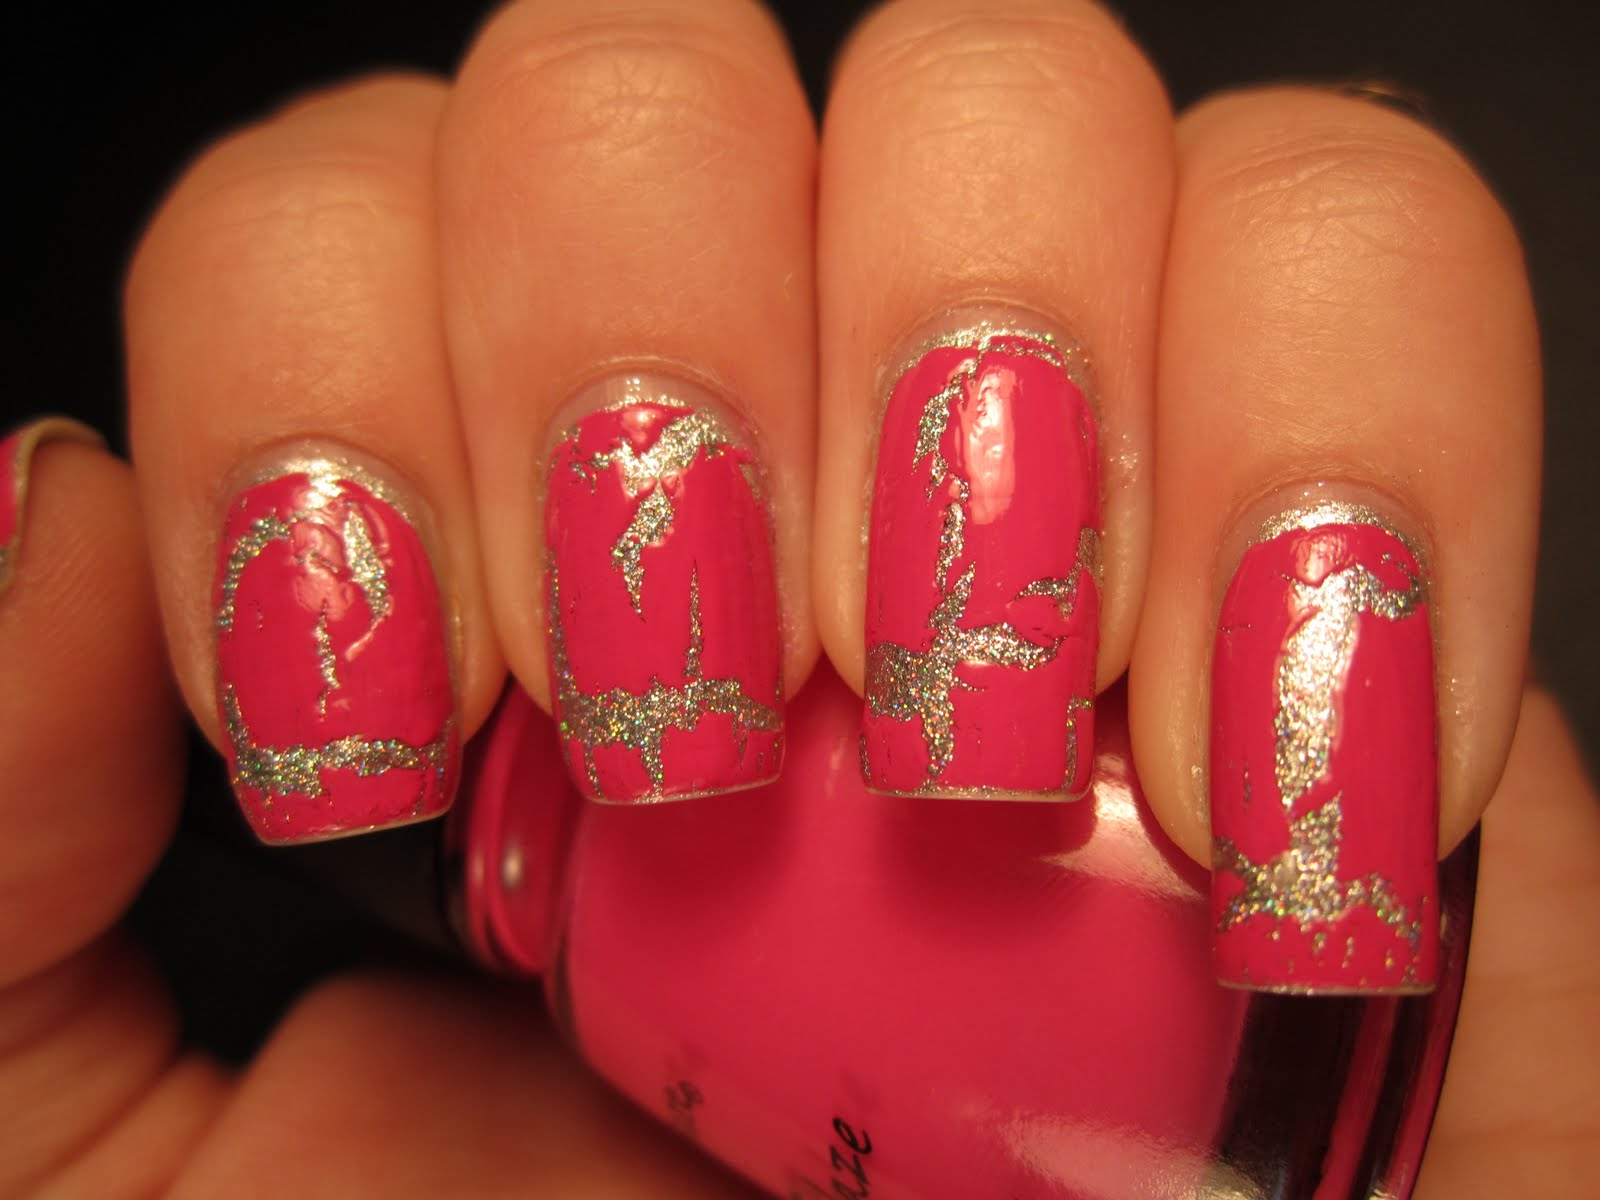 Jessica\'s Nail Art: My first Crackle Nail Polish...